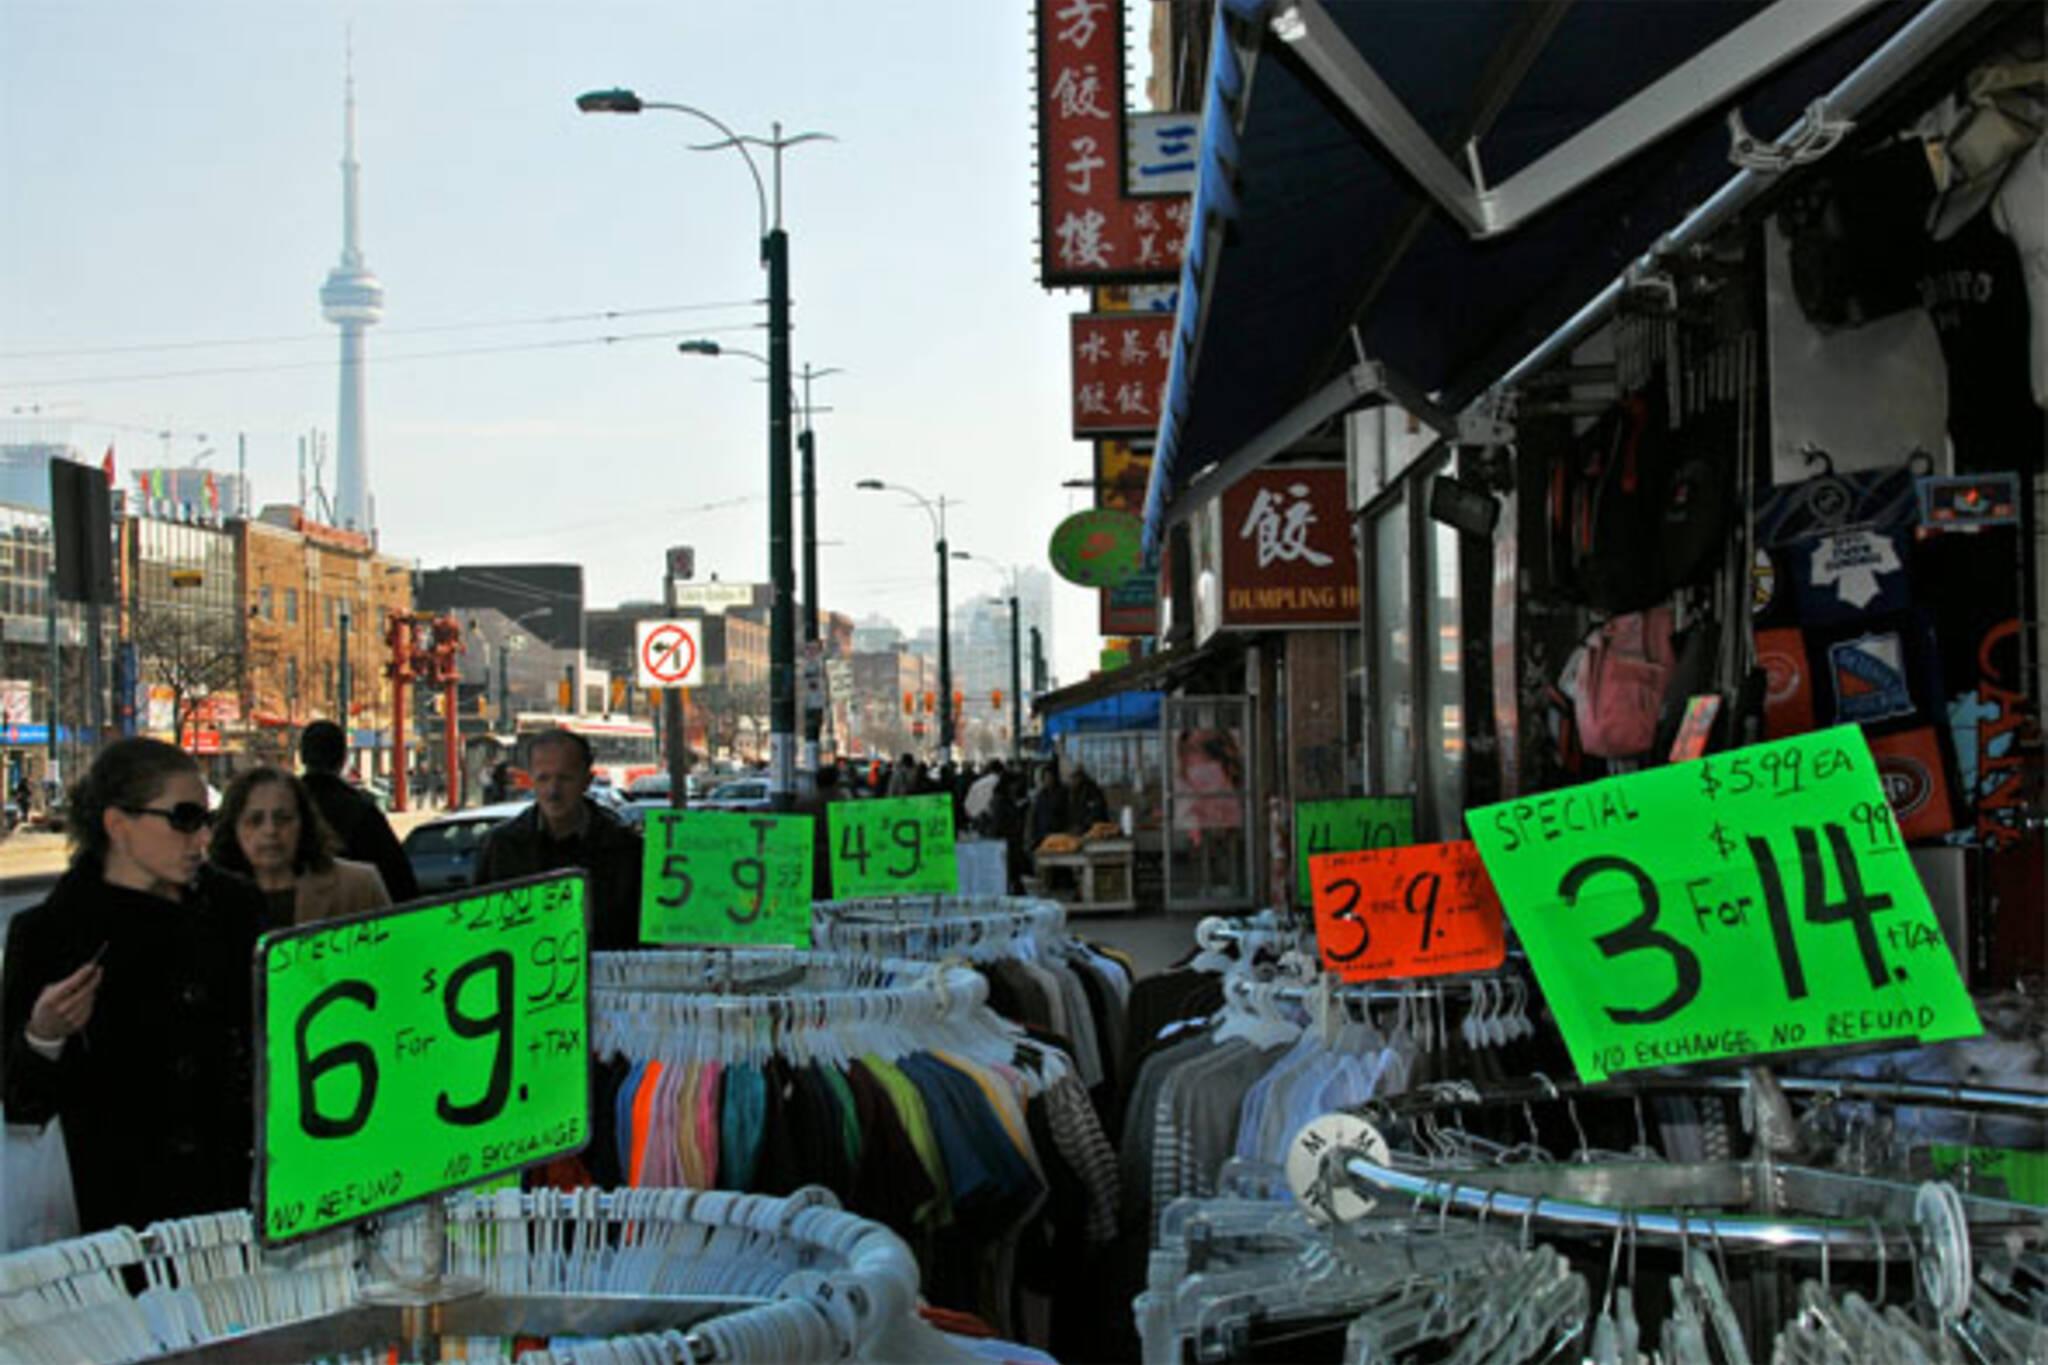 chinatown vendors